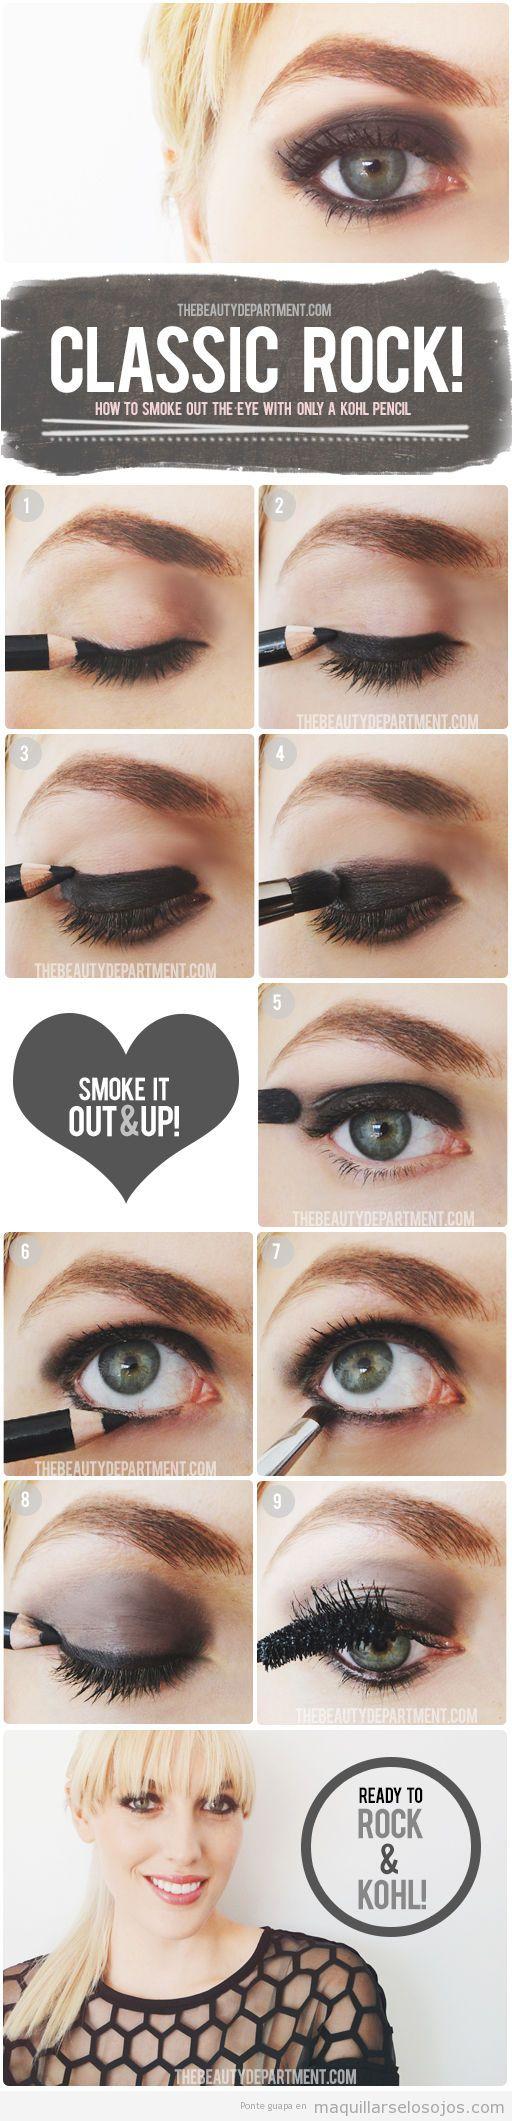 Tutorial paso a paso aprender maquillar ojos ahumados de manera fácil